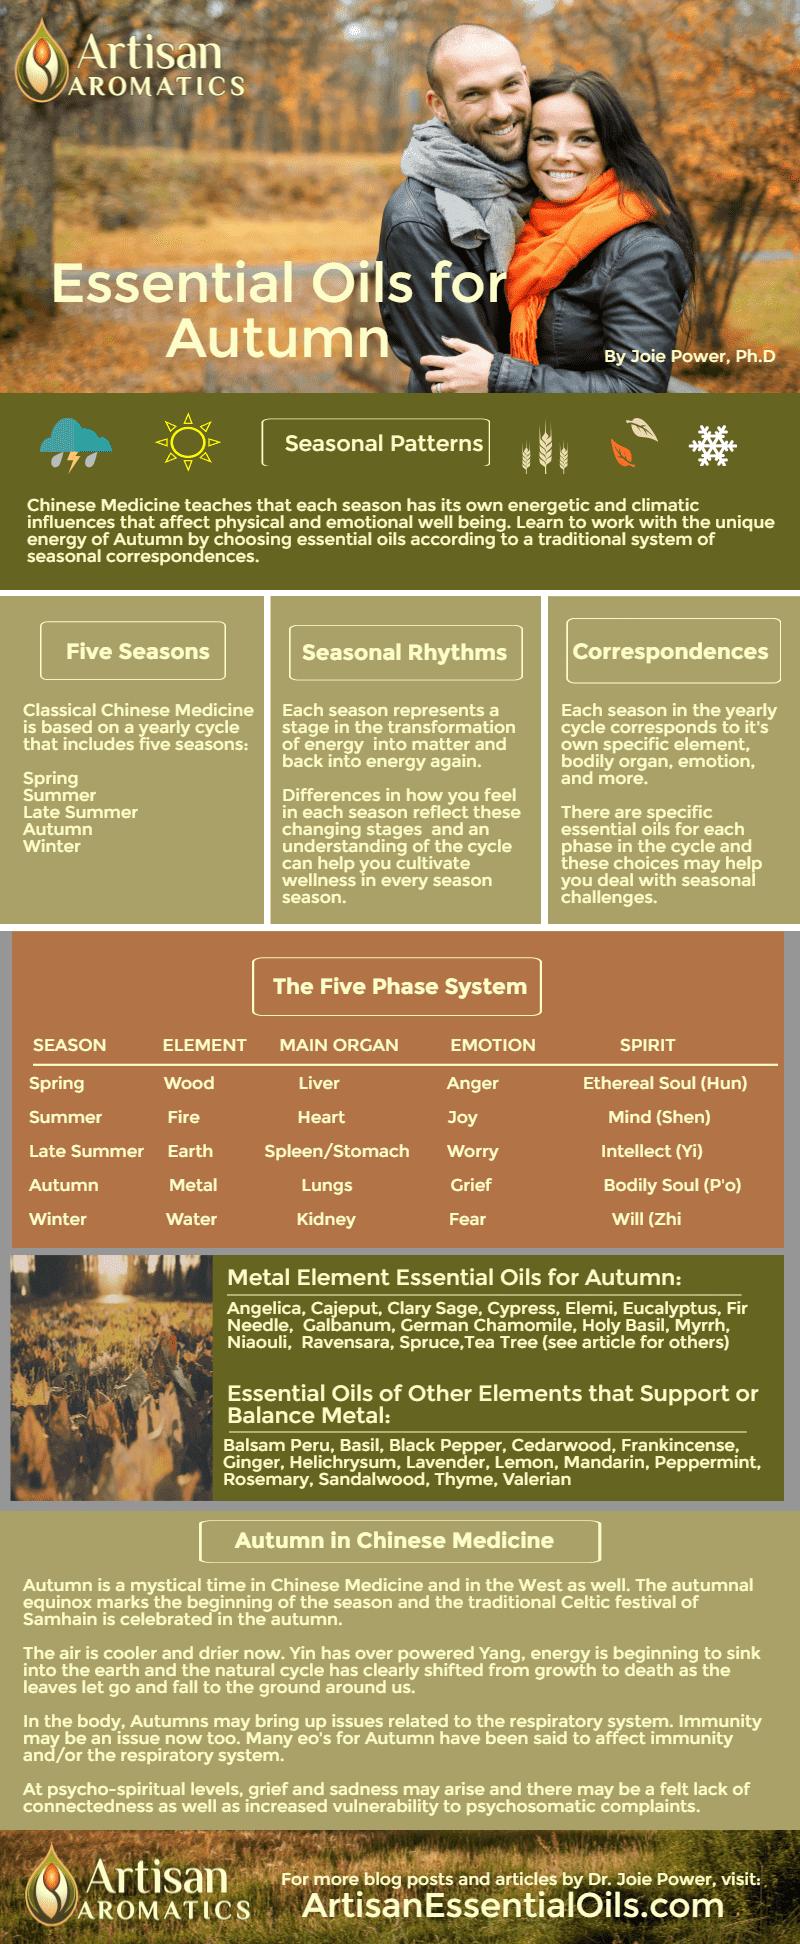 Artisan-Aromatics-EOs-for-Autumn-Infographic-Dr-Joie-Power